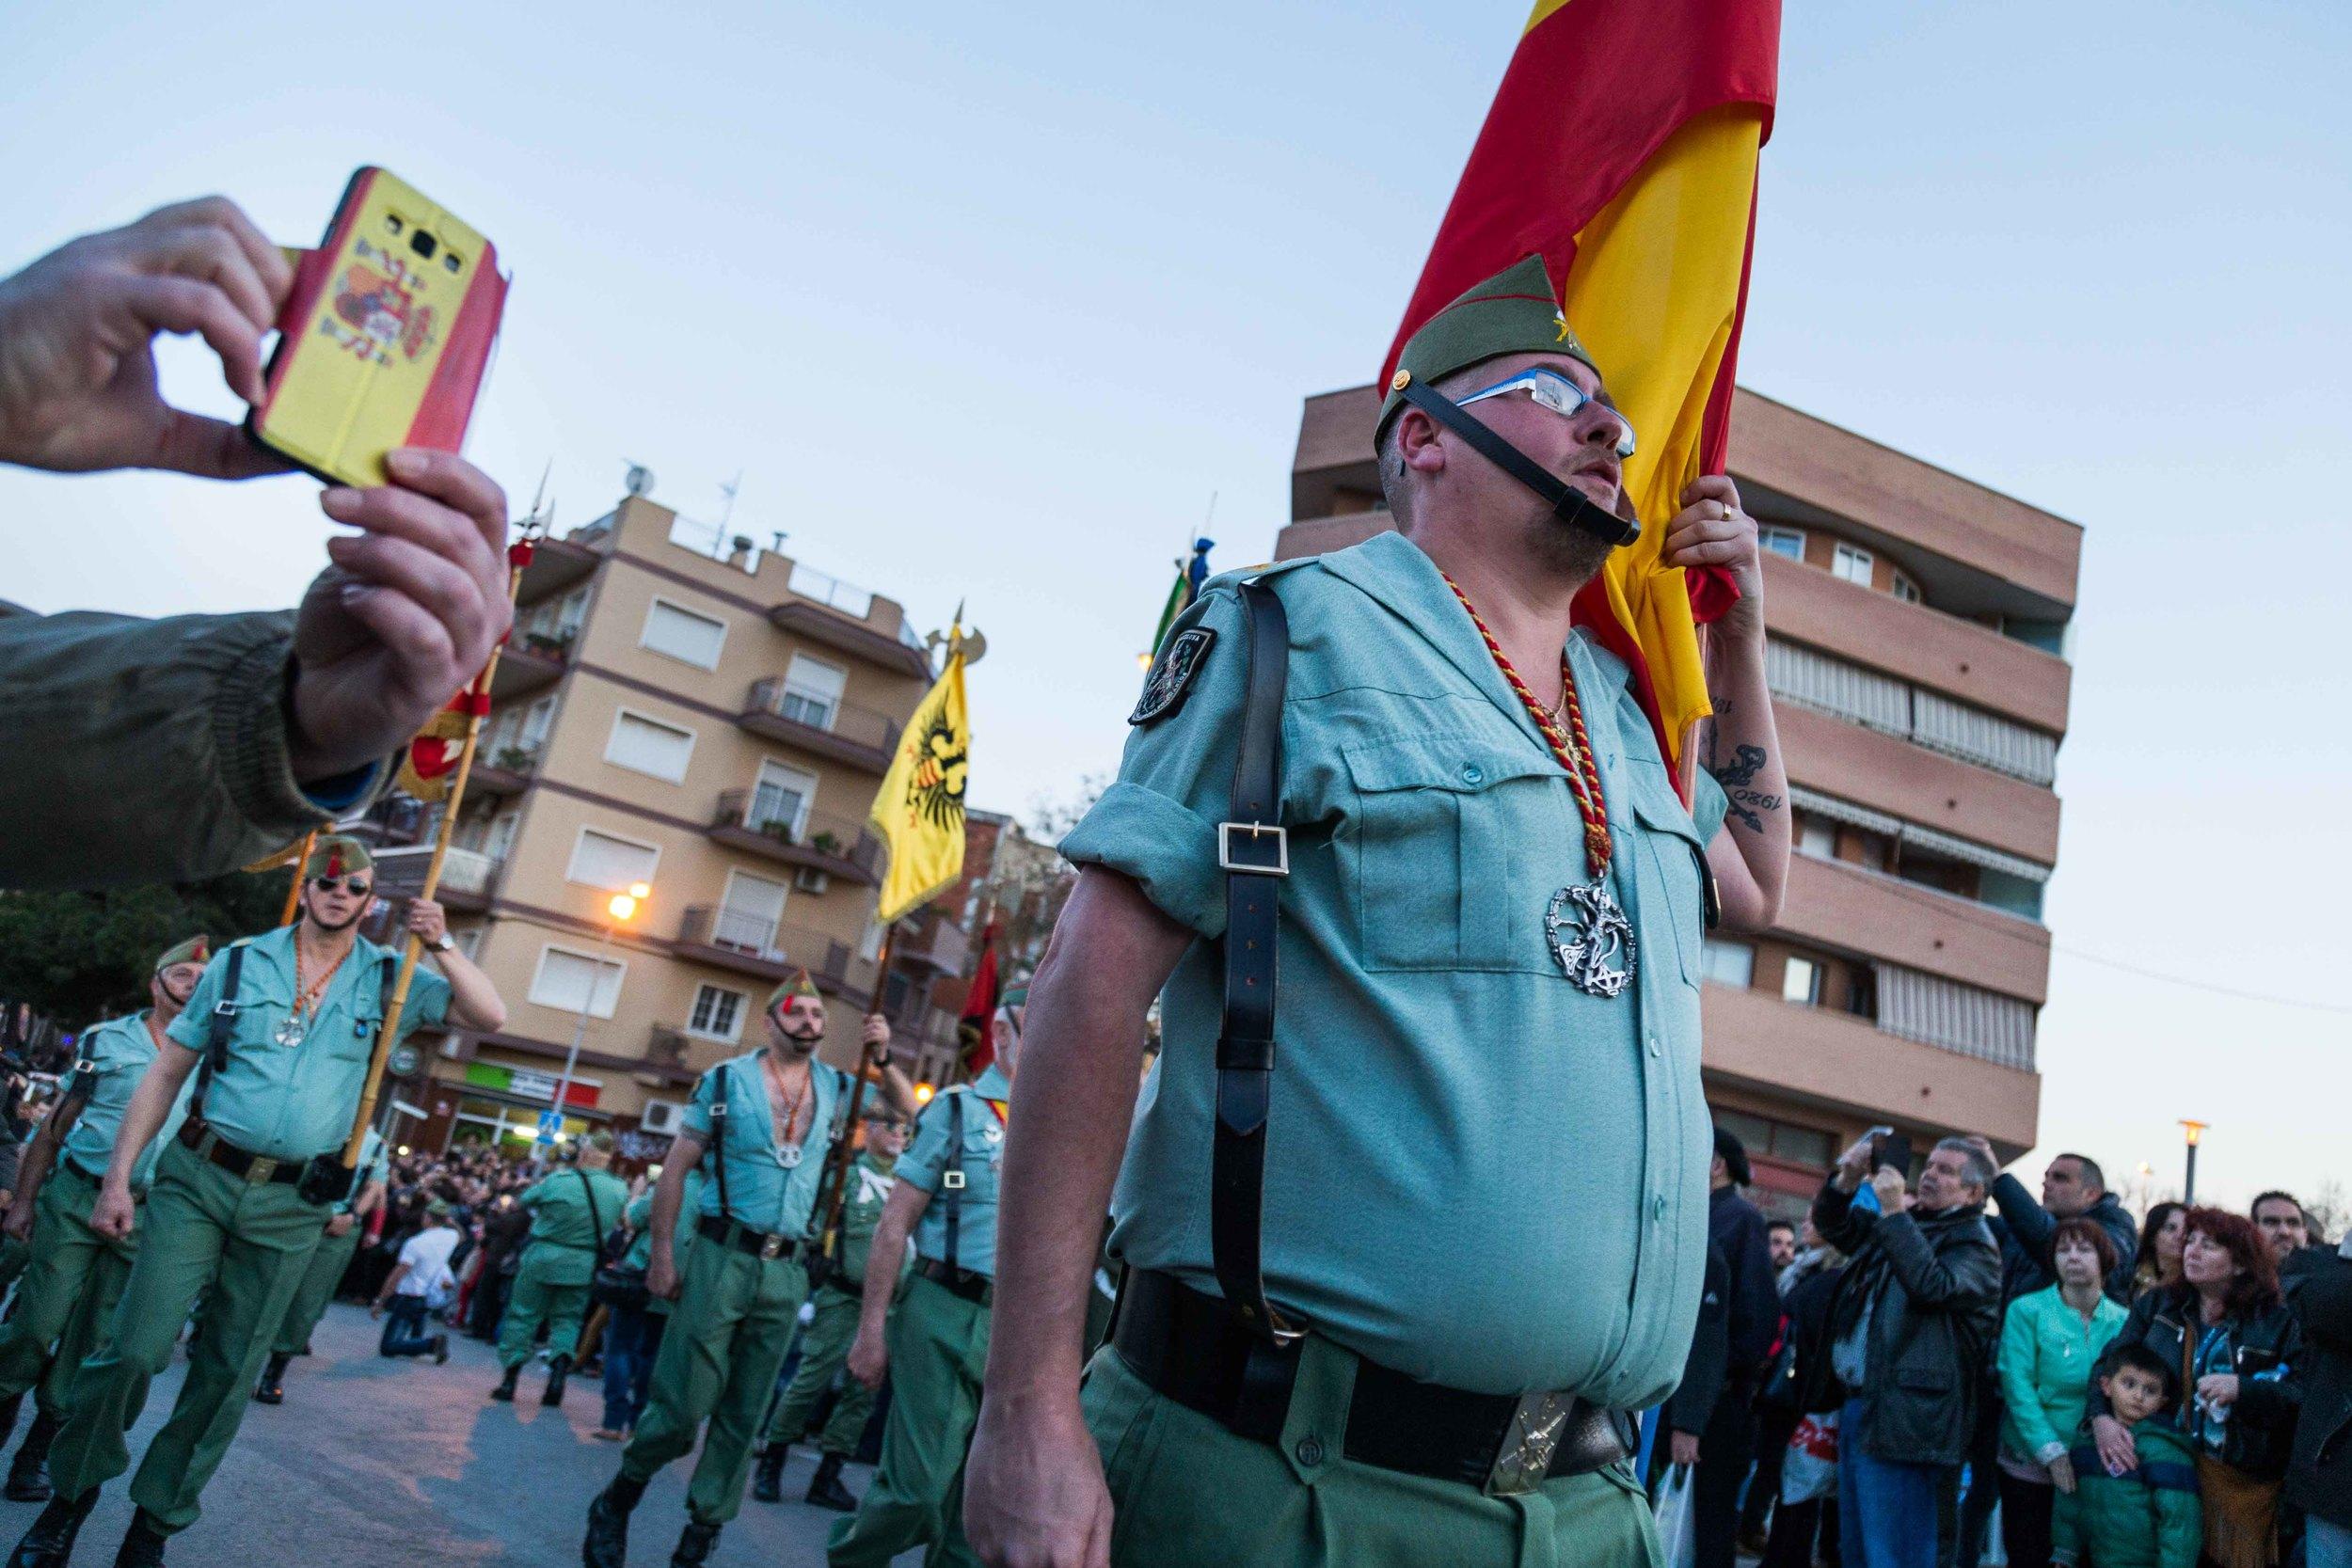 Procesion de los Legionarios en l'Hospitalet del Llobregat